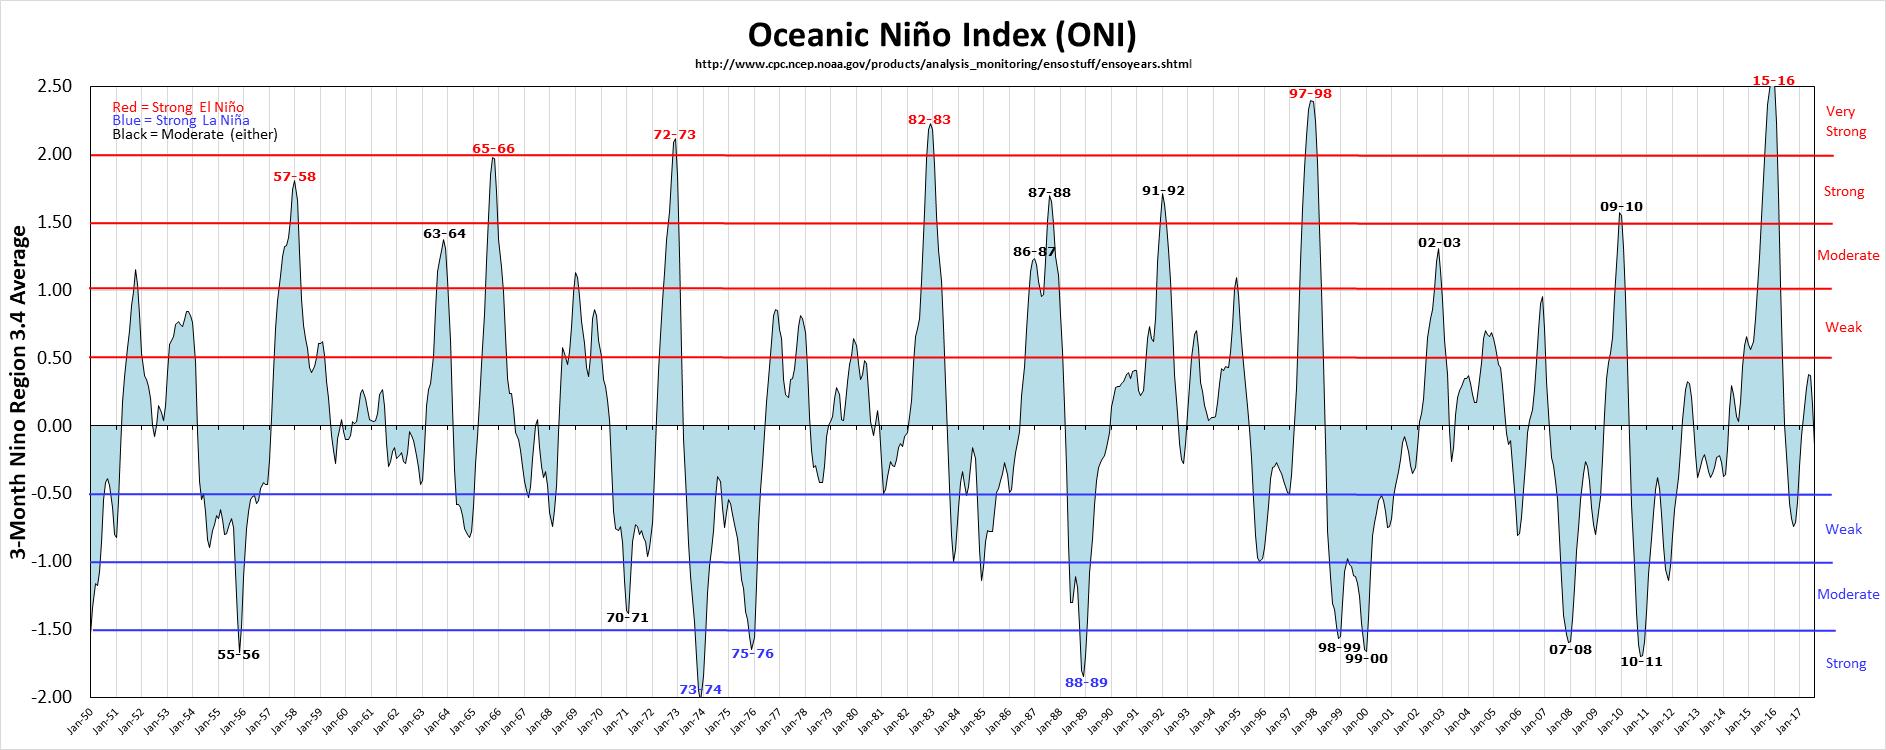 oscillation from El Nino to La Nina